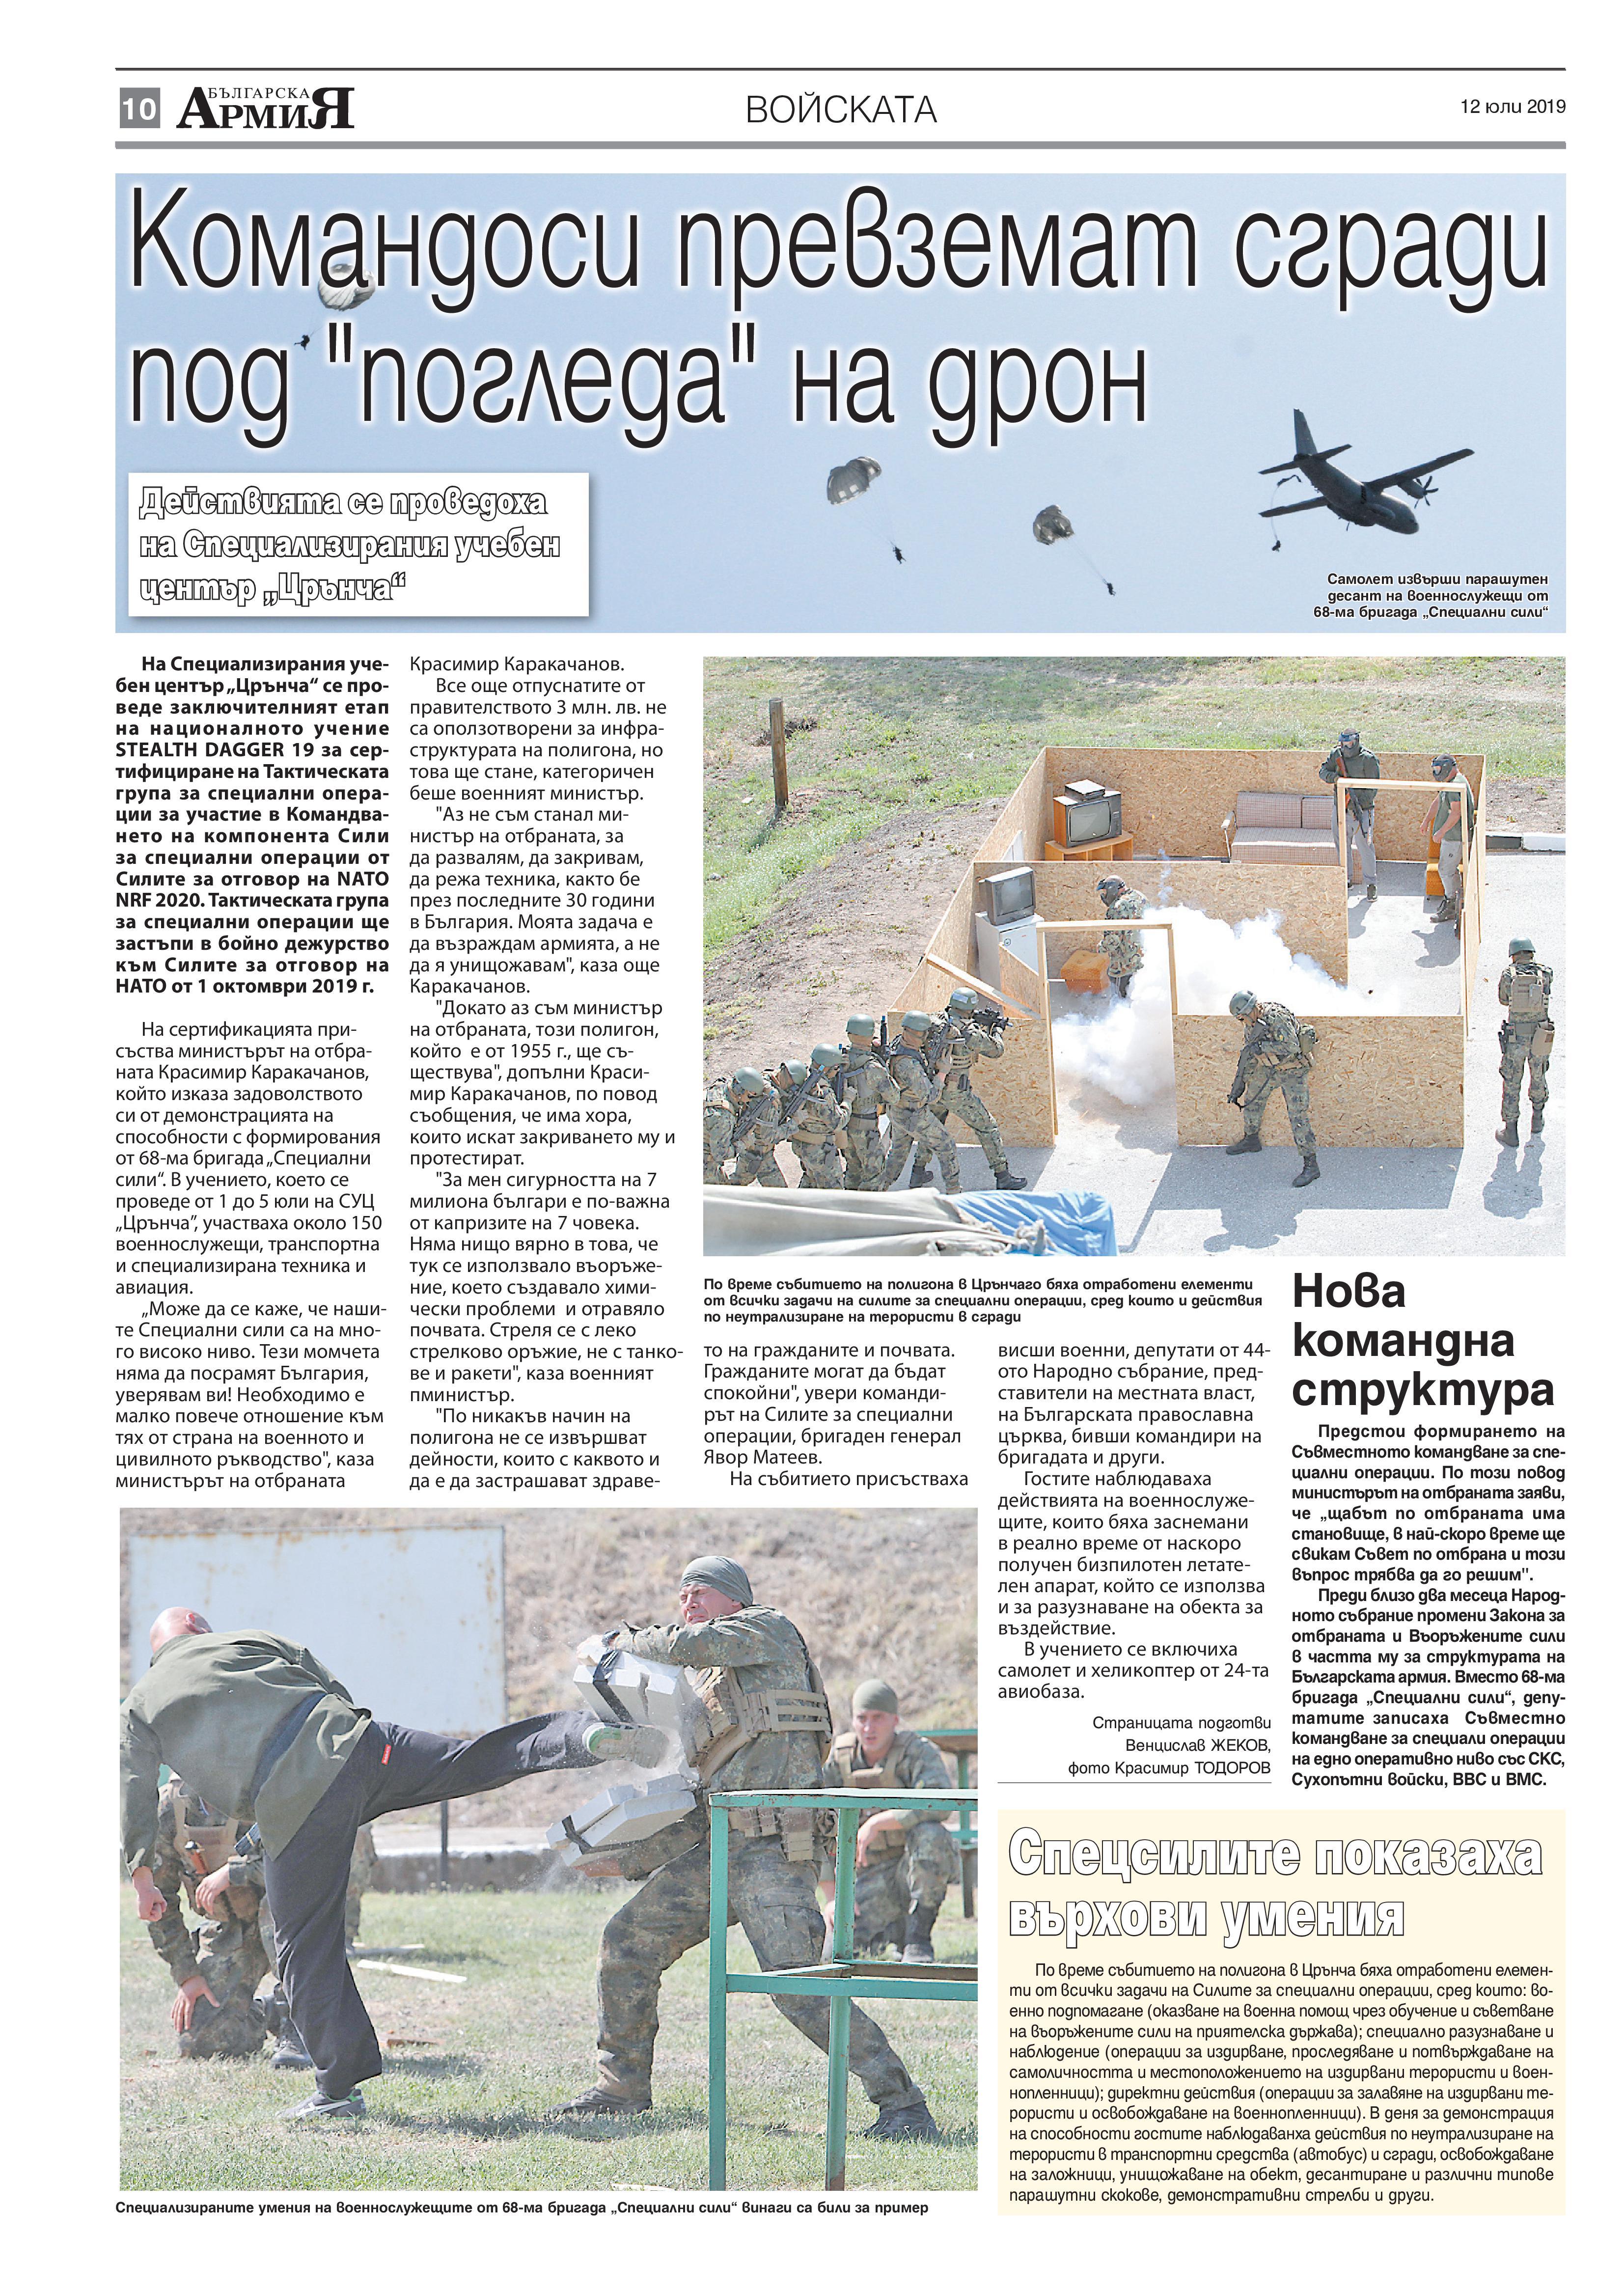 https://armymedia.bg/wp-content/uploads/2015/06/10-29.jpg